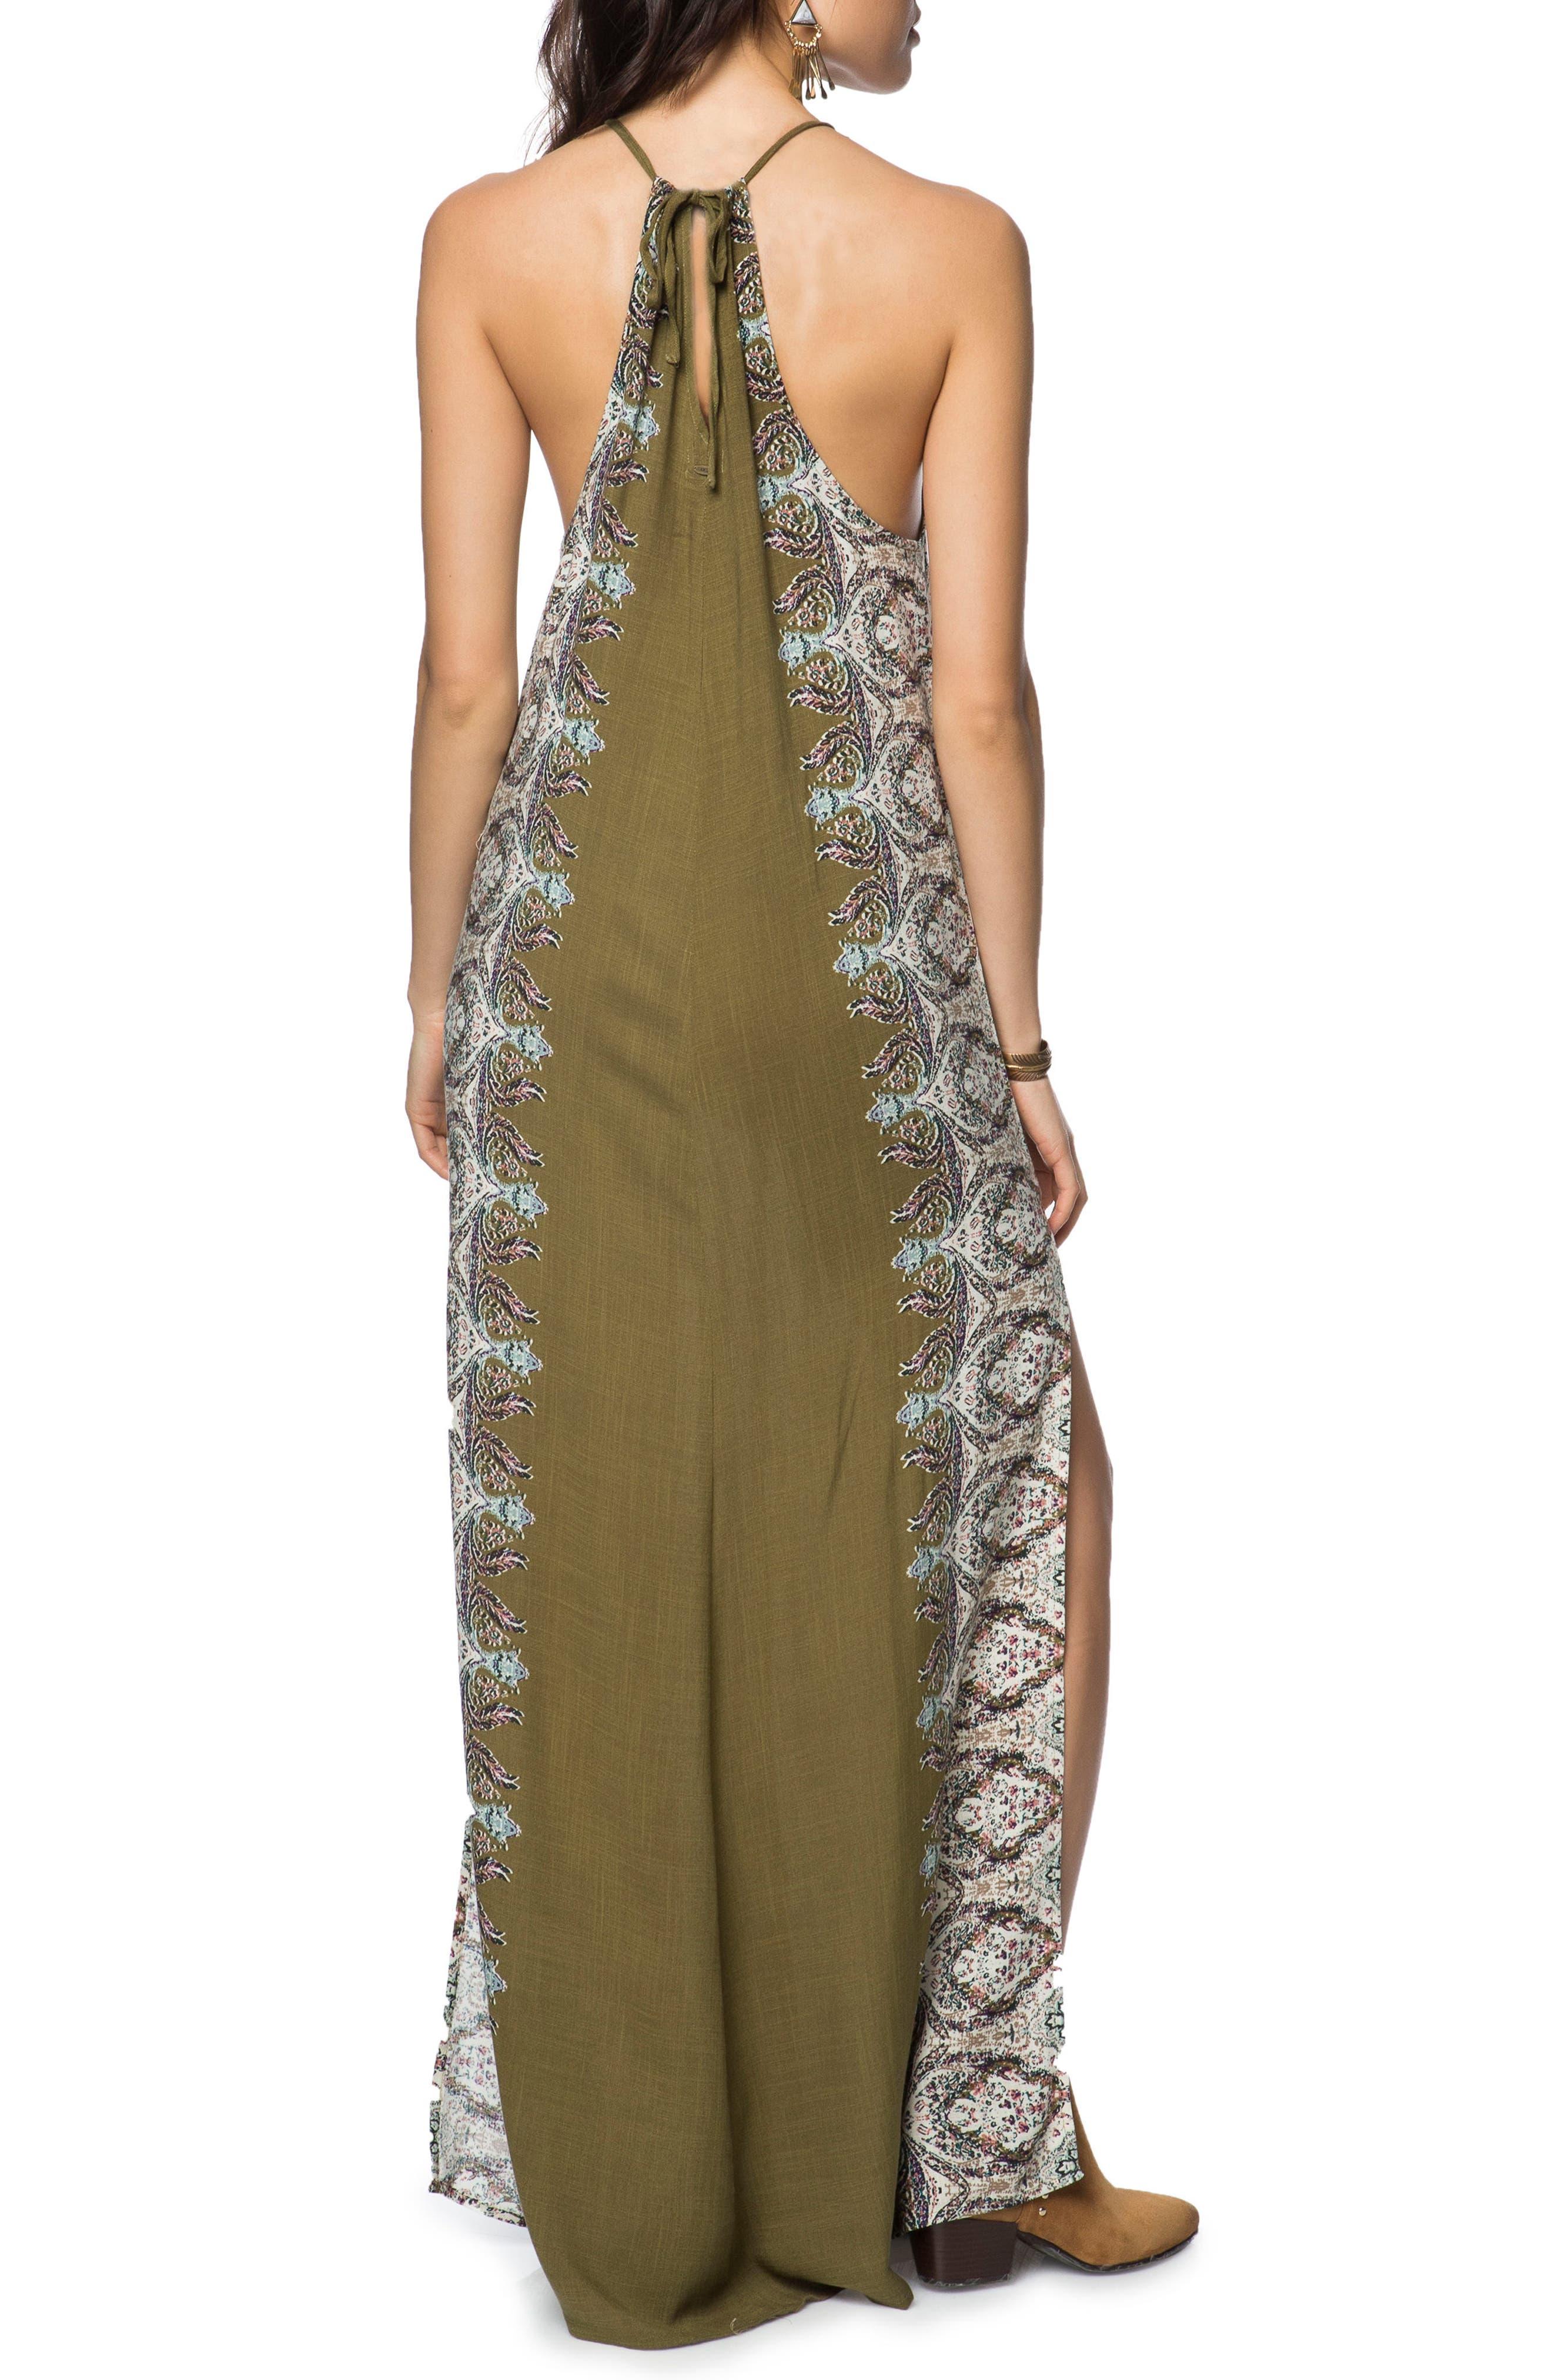 Brinkley Maxi Dress,                             Alternate thumbnail 2, color,                             307